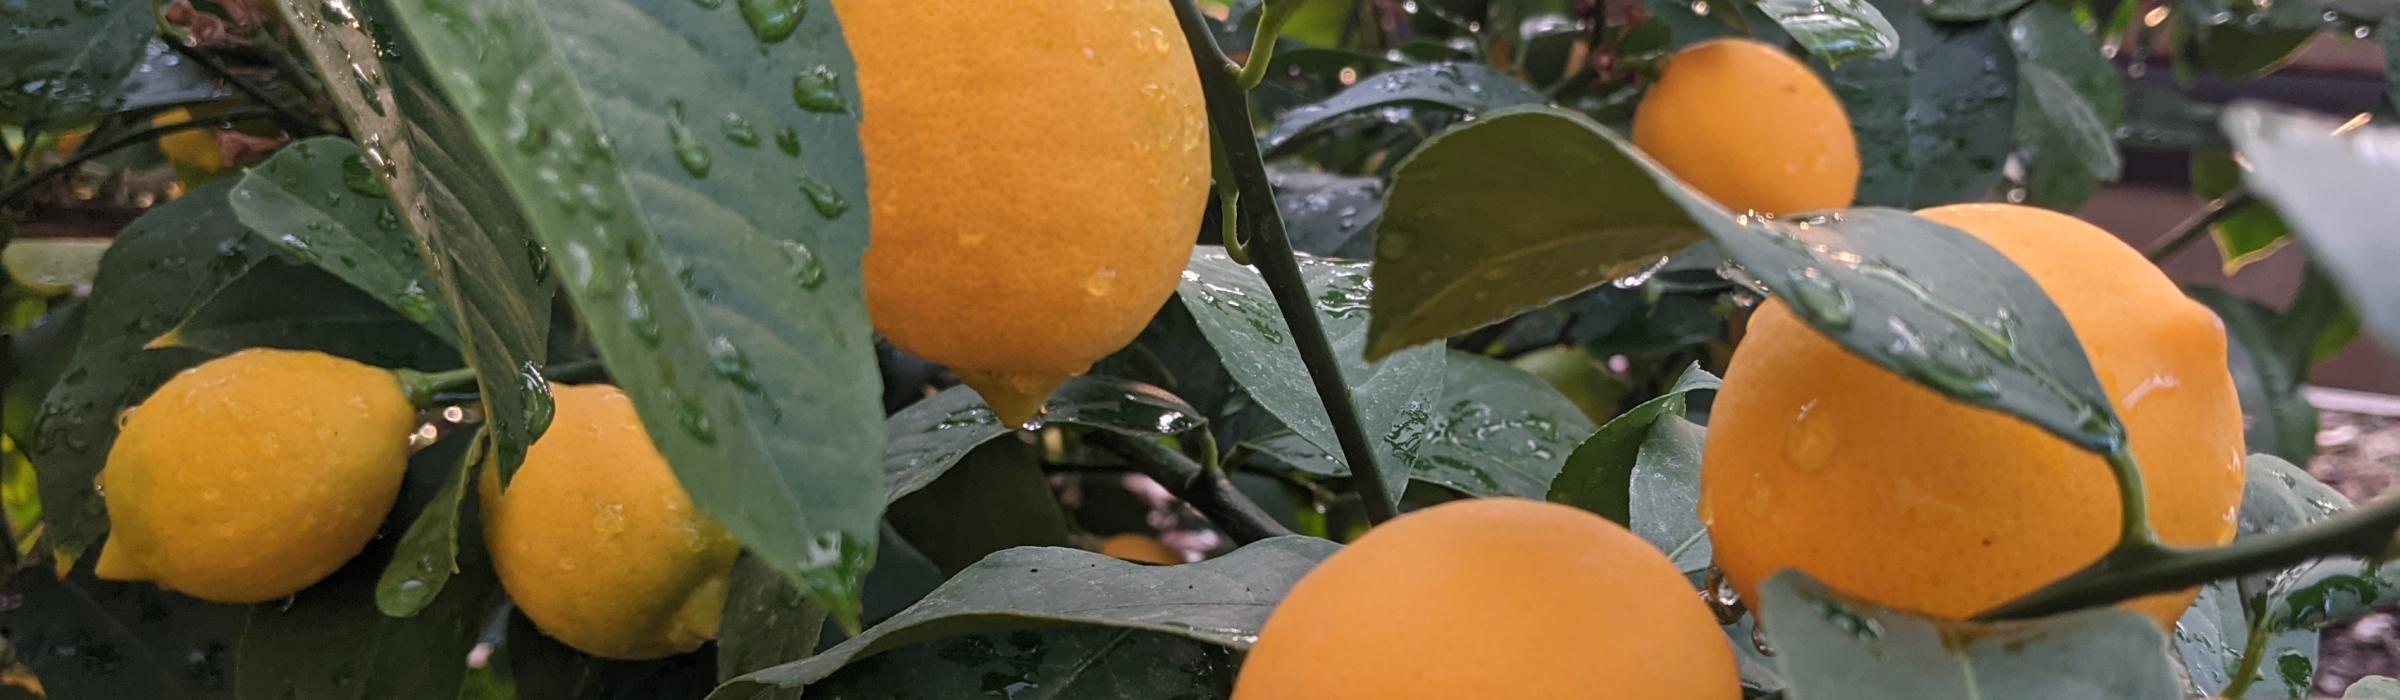 Meyer's lemons. Photo: C Braungardt, 2021